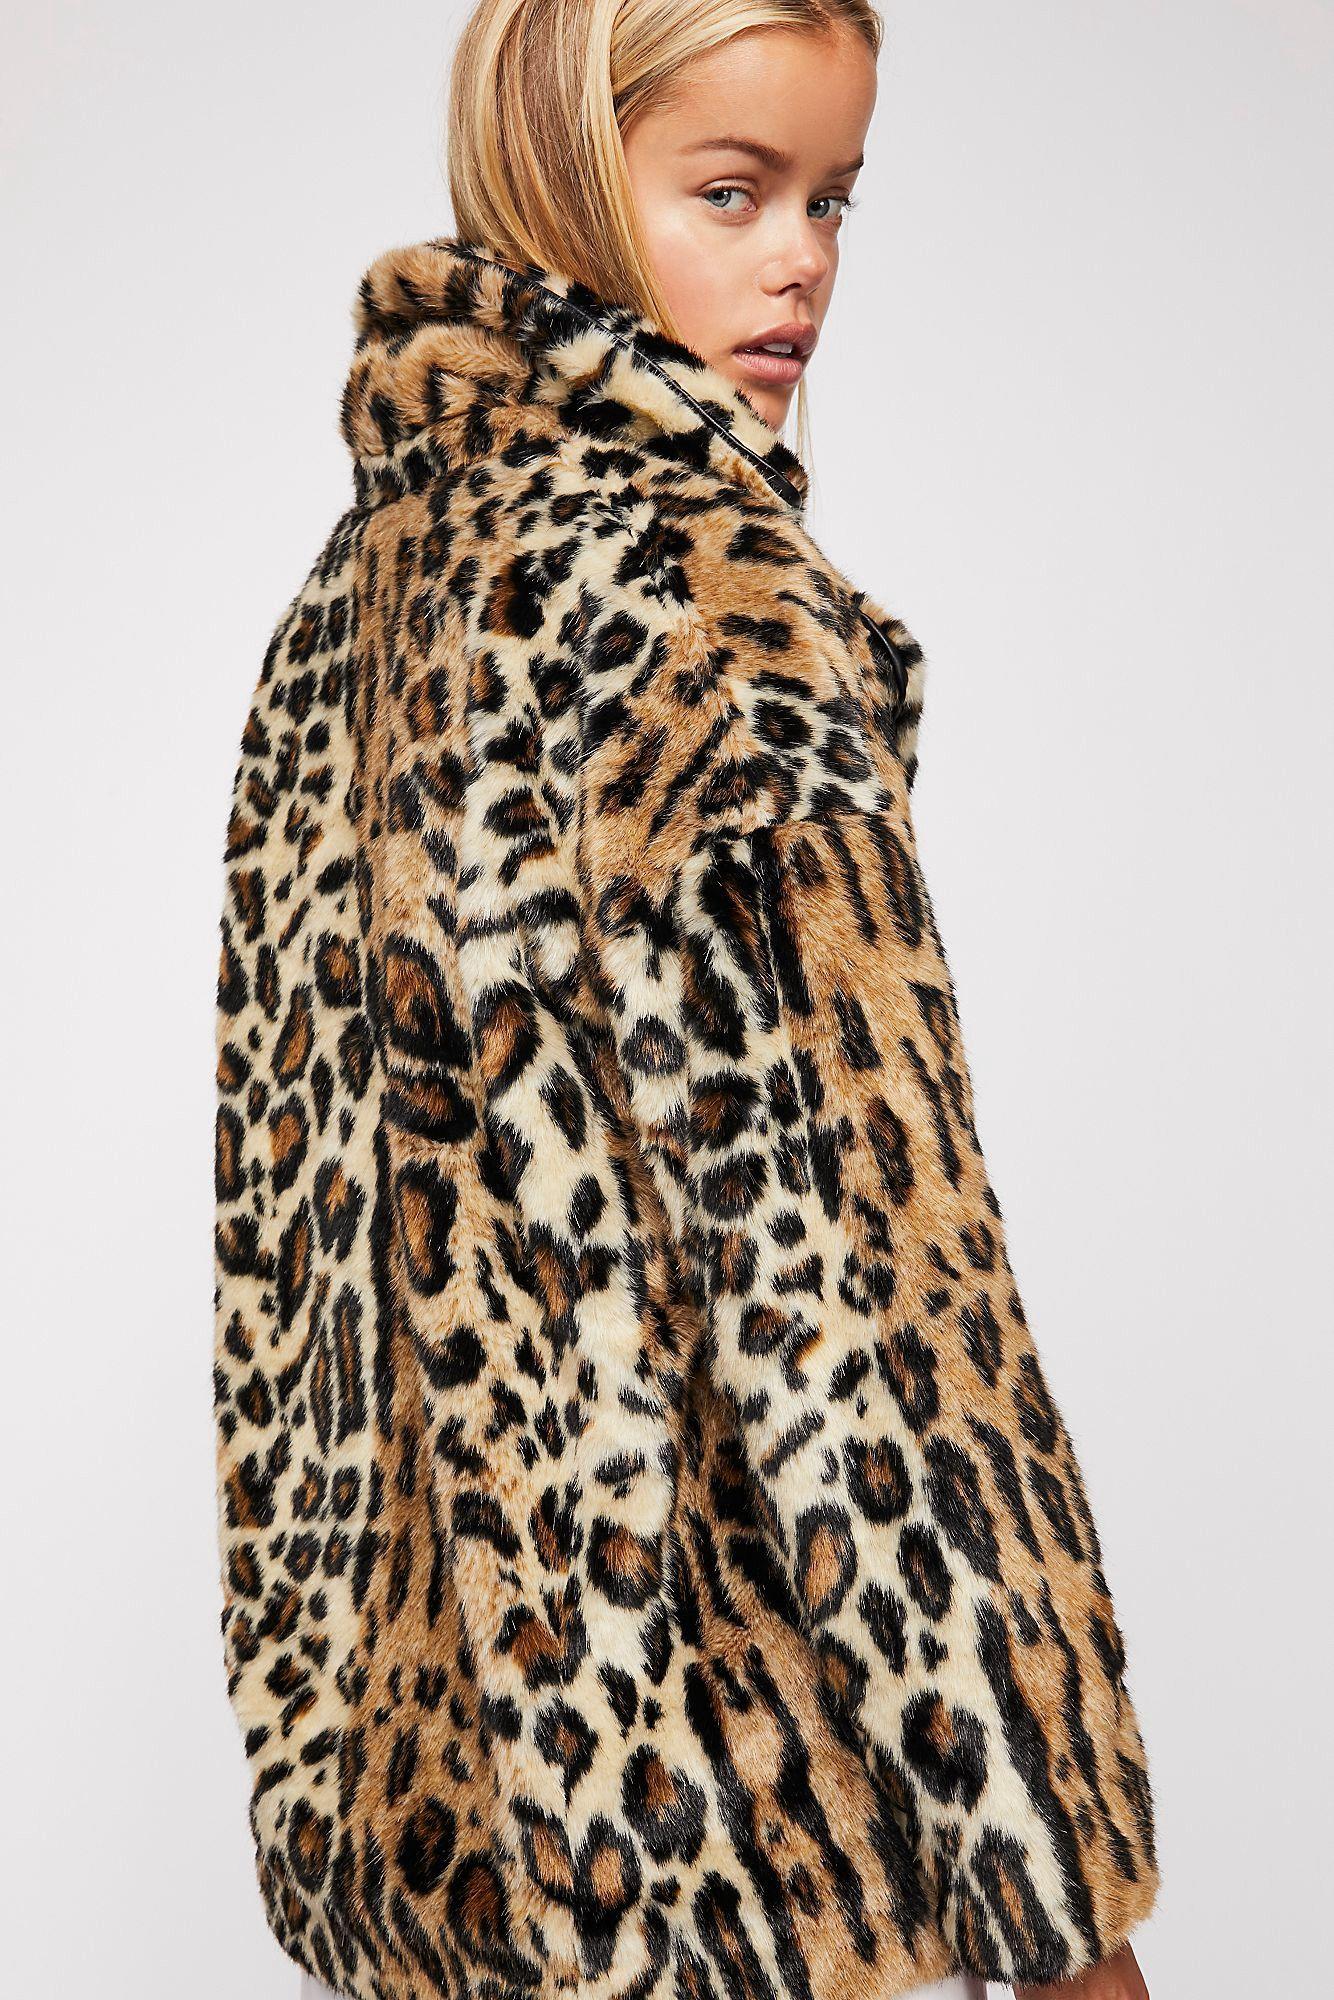 3df3c33b98e2 Free People Kate Leopard Coat - XS